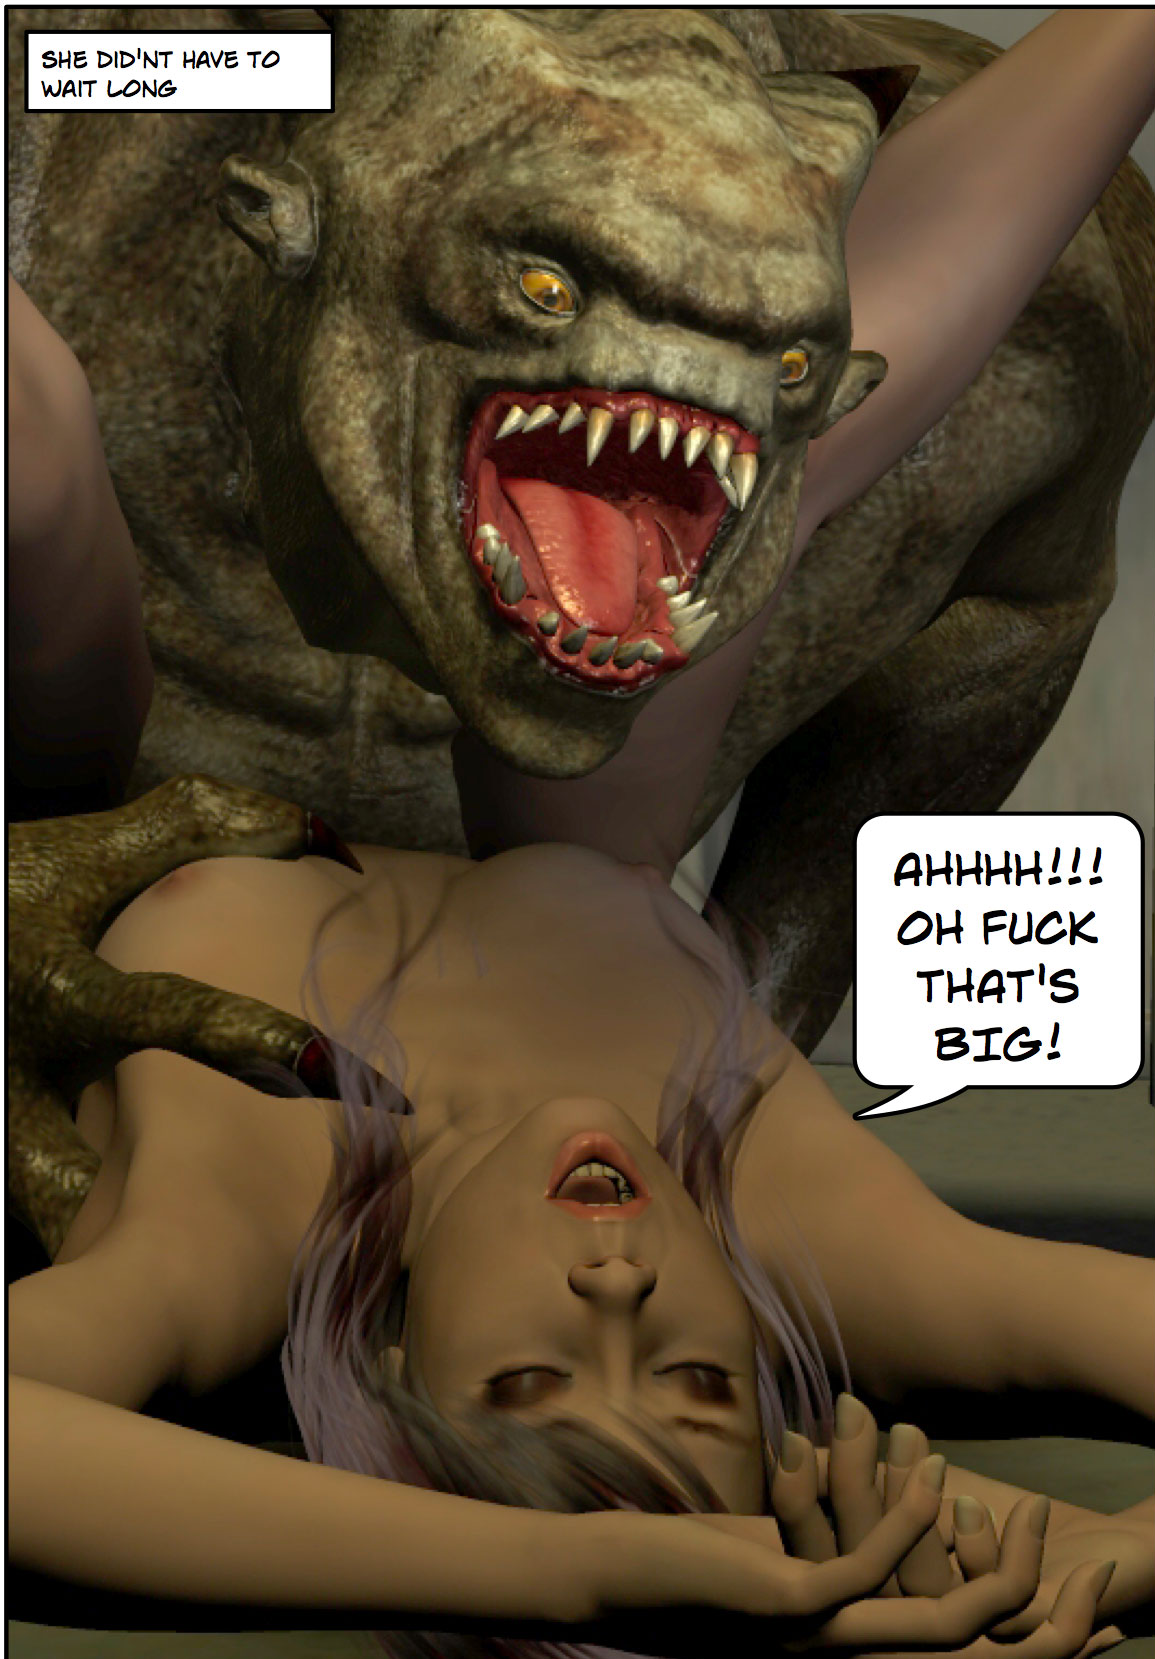 Monsters v aliens nude hentai galleries